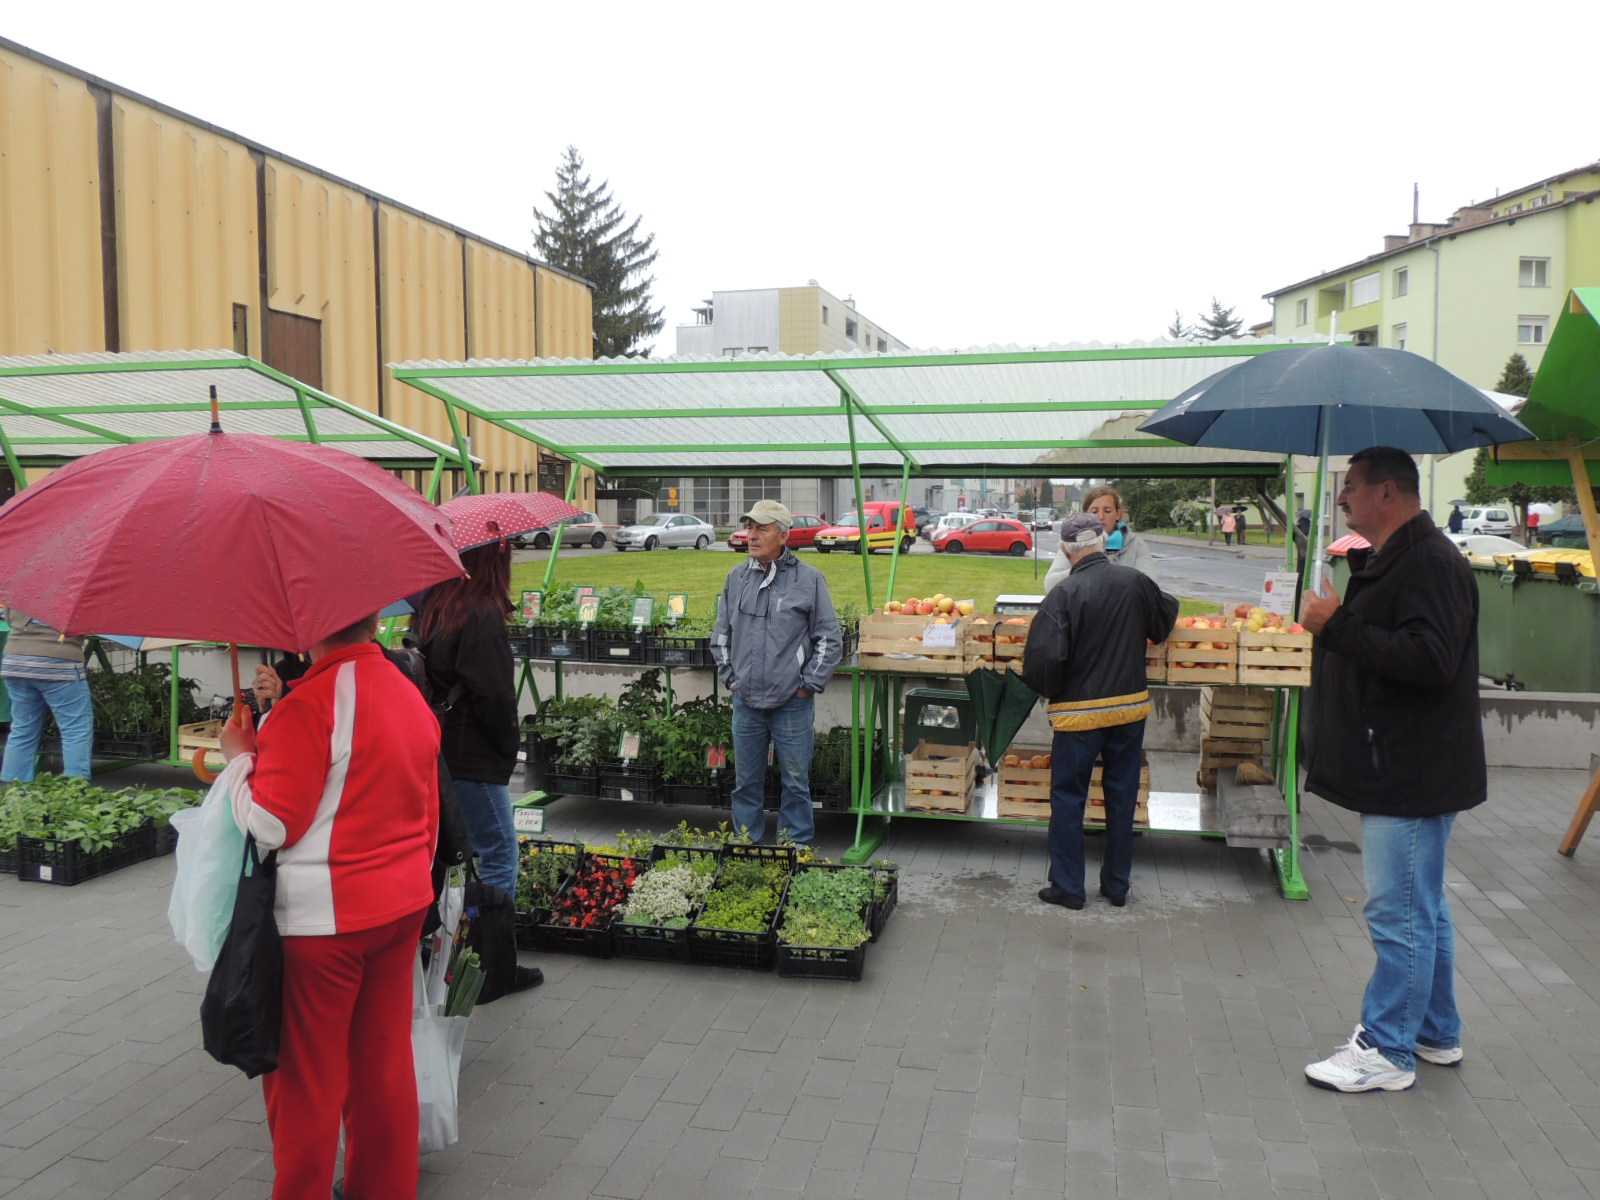 Zelena japka, trgovina brez plastične embalaže